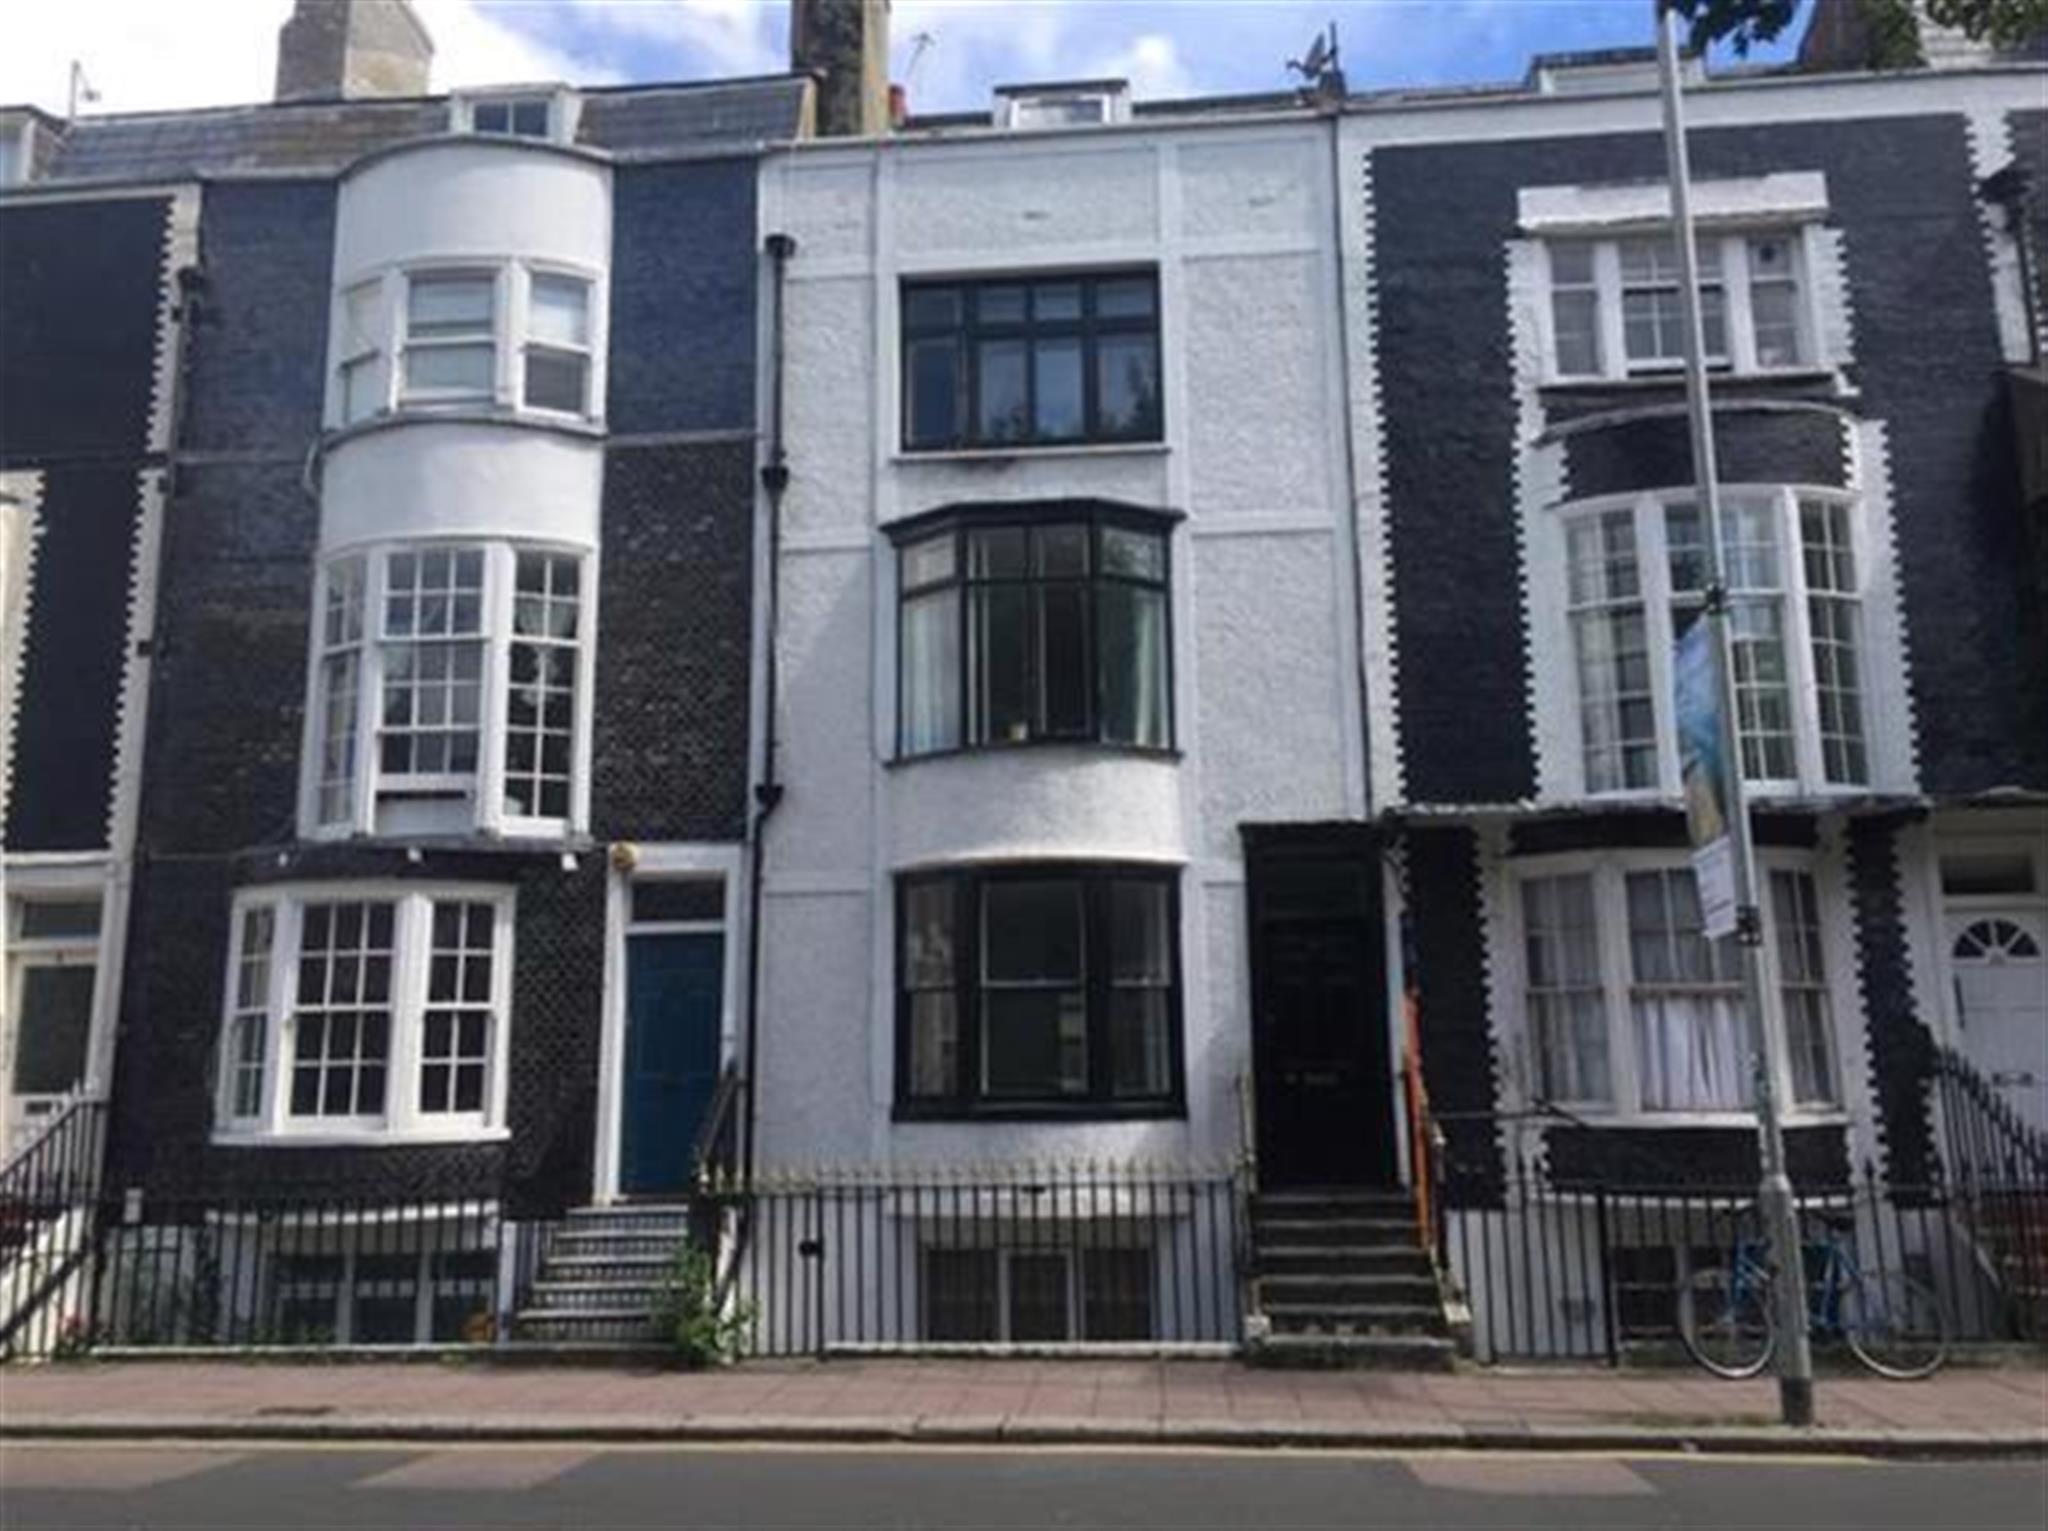 Apartment to rent grand parade brighton bn2 9qb for Room to rent brighton